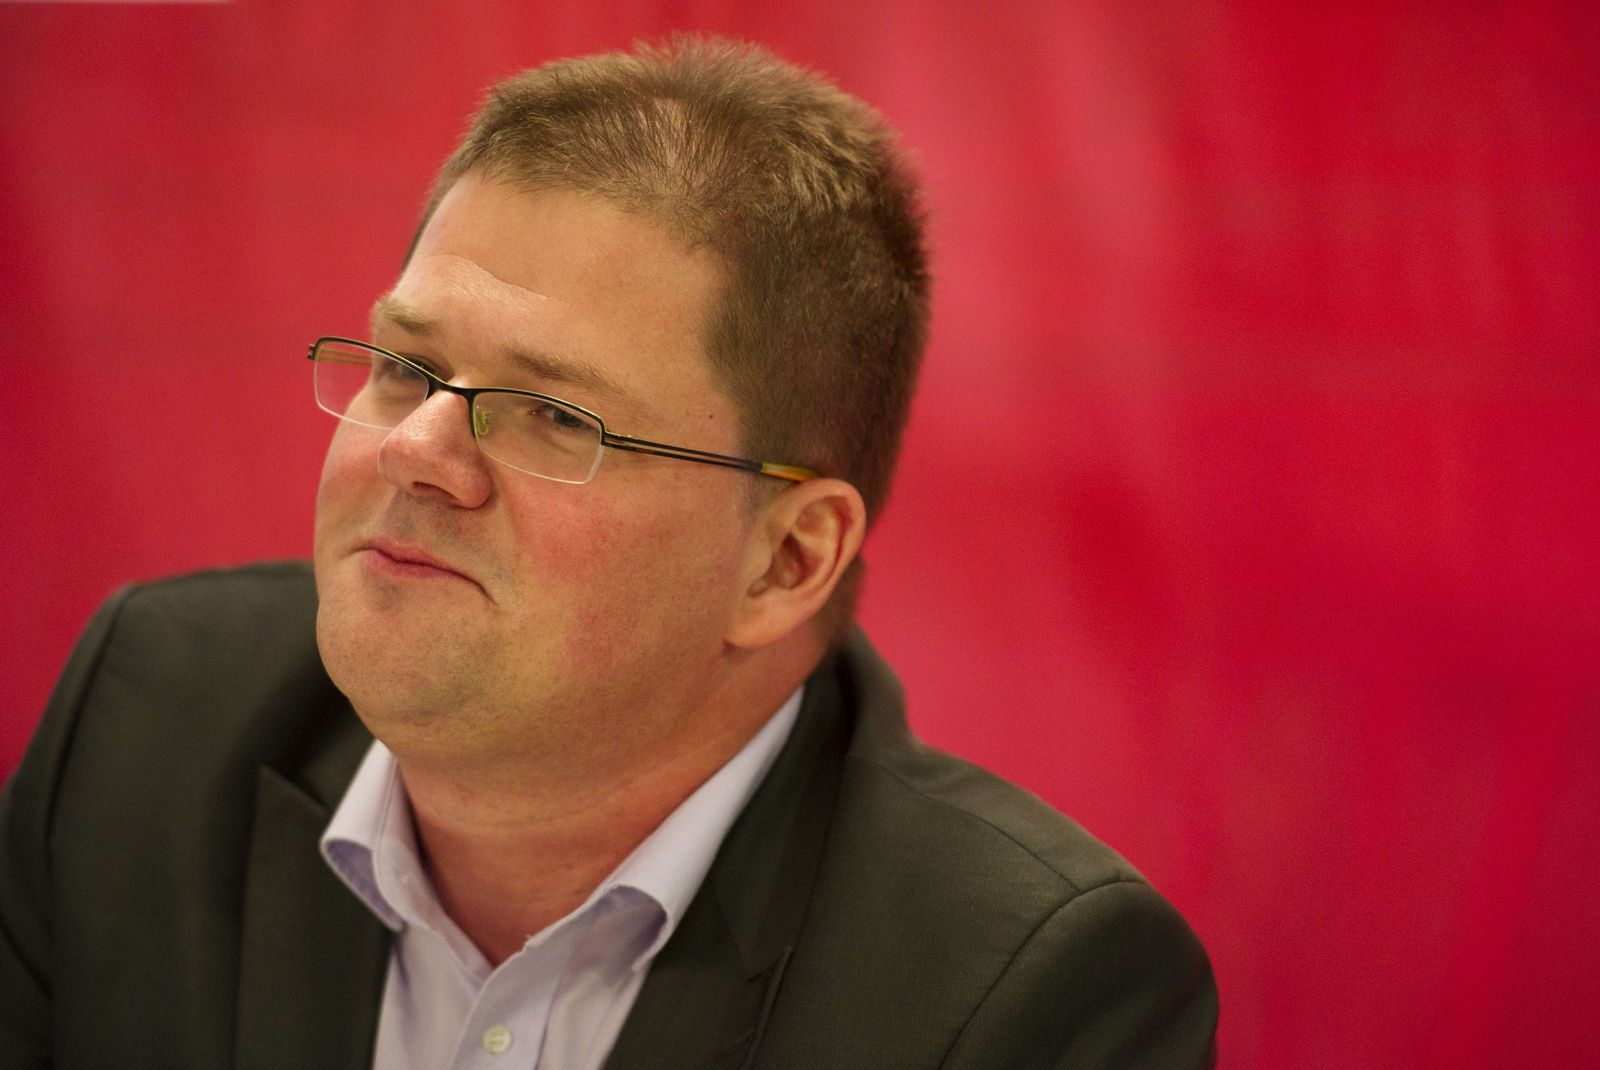 NPD Parteitag / Neuruppin / Holger Apfel